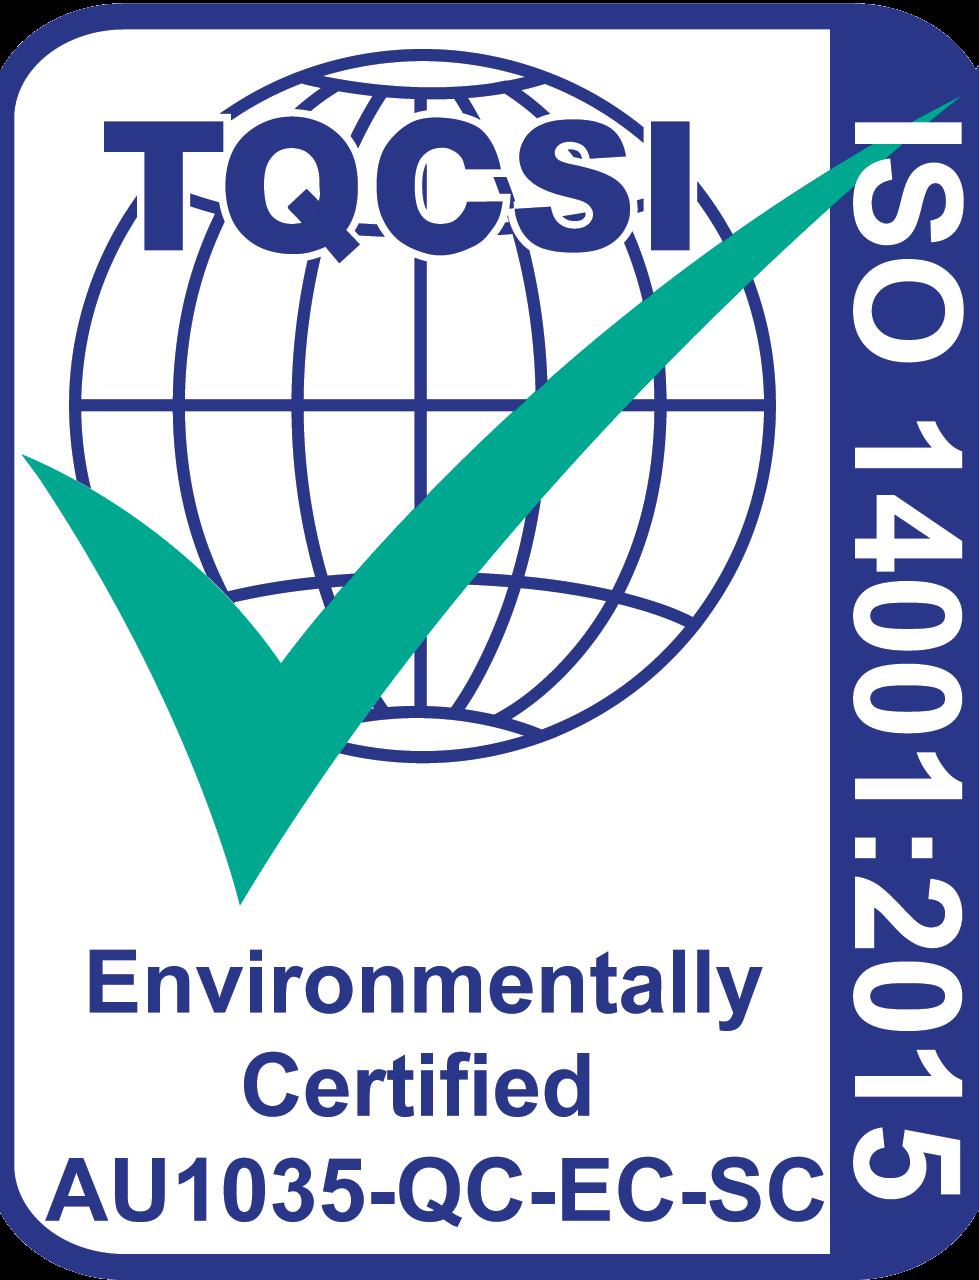 ISO 1400 Accreditation